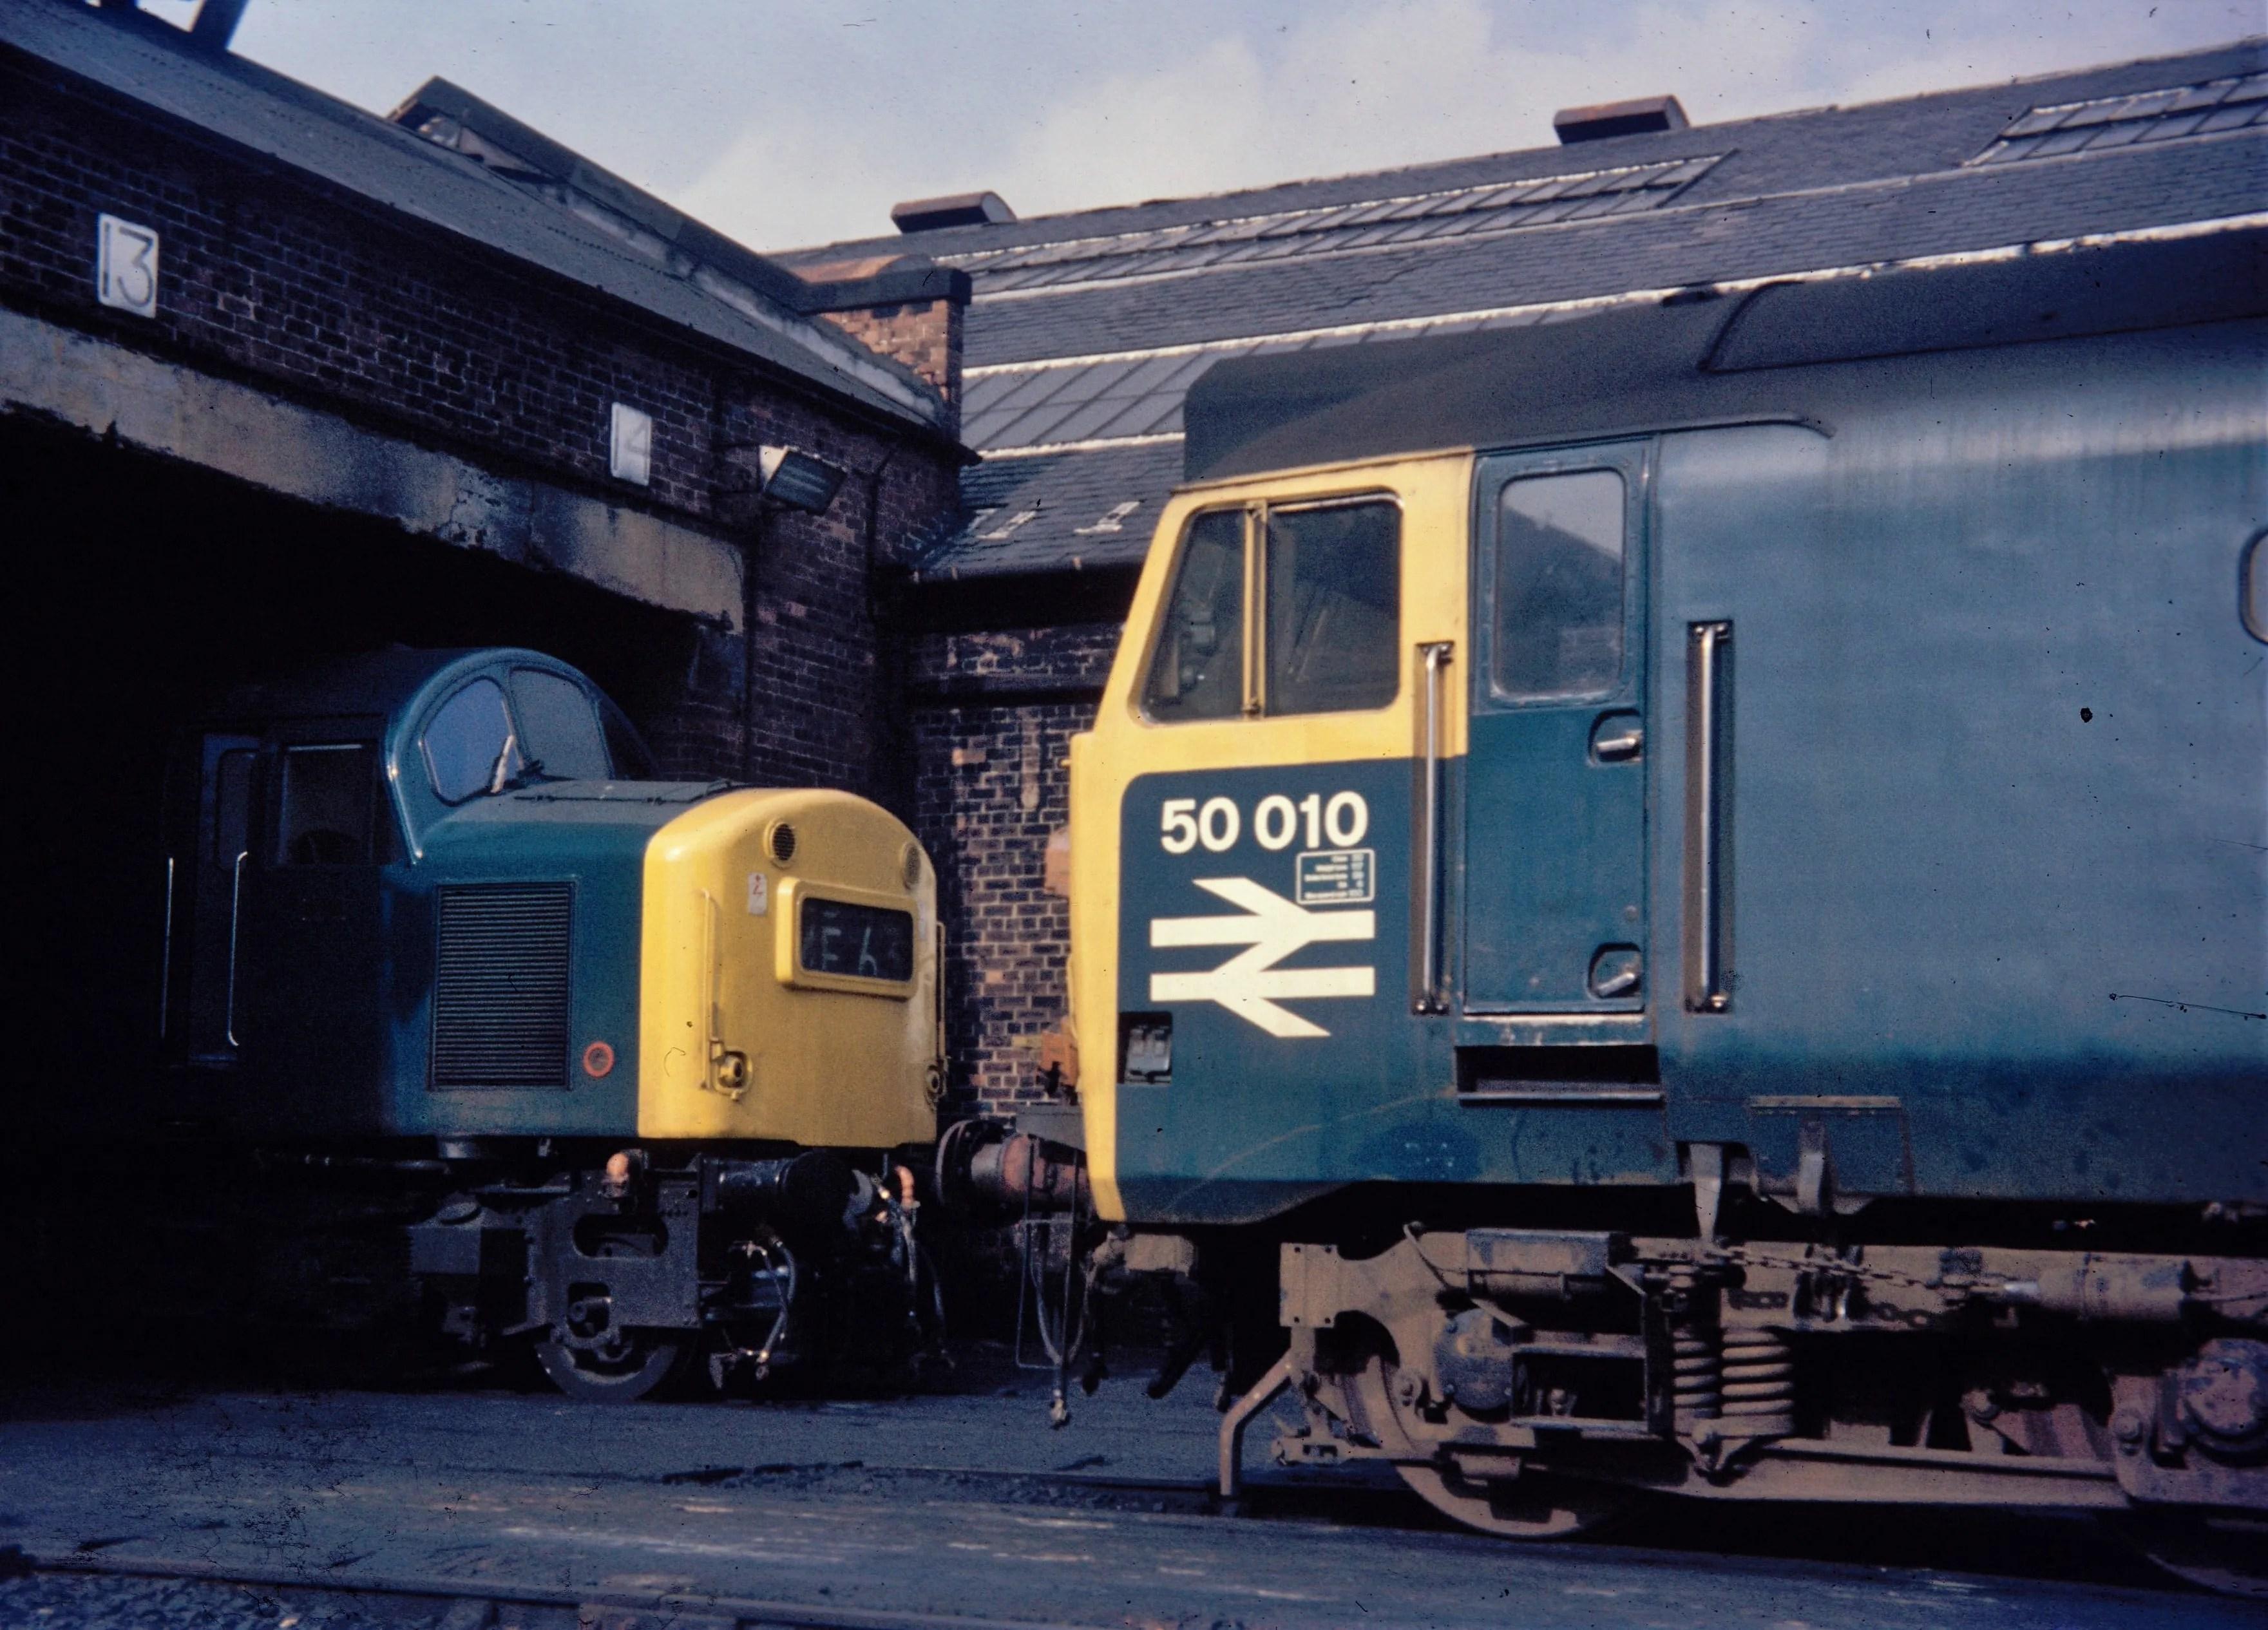 Class 40 meets a Class 50 diesel locomotive at Polmadie Depot